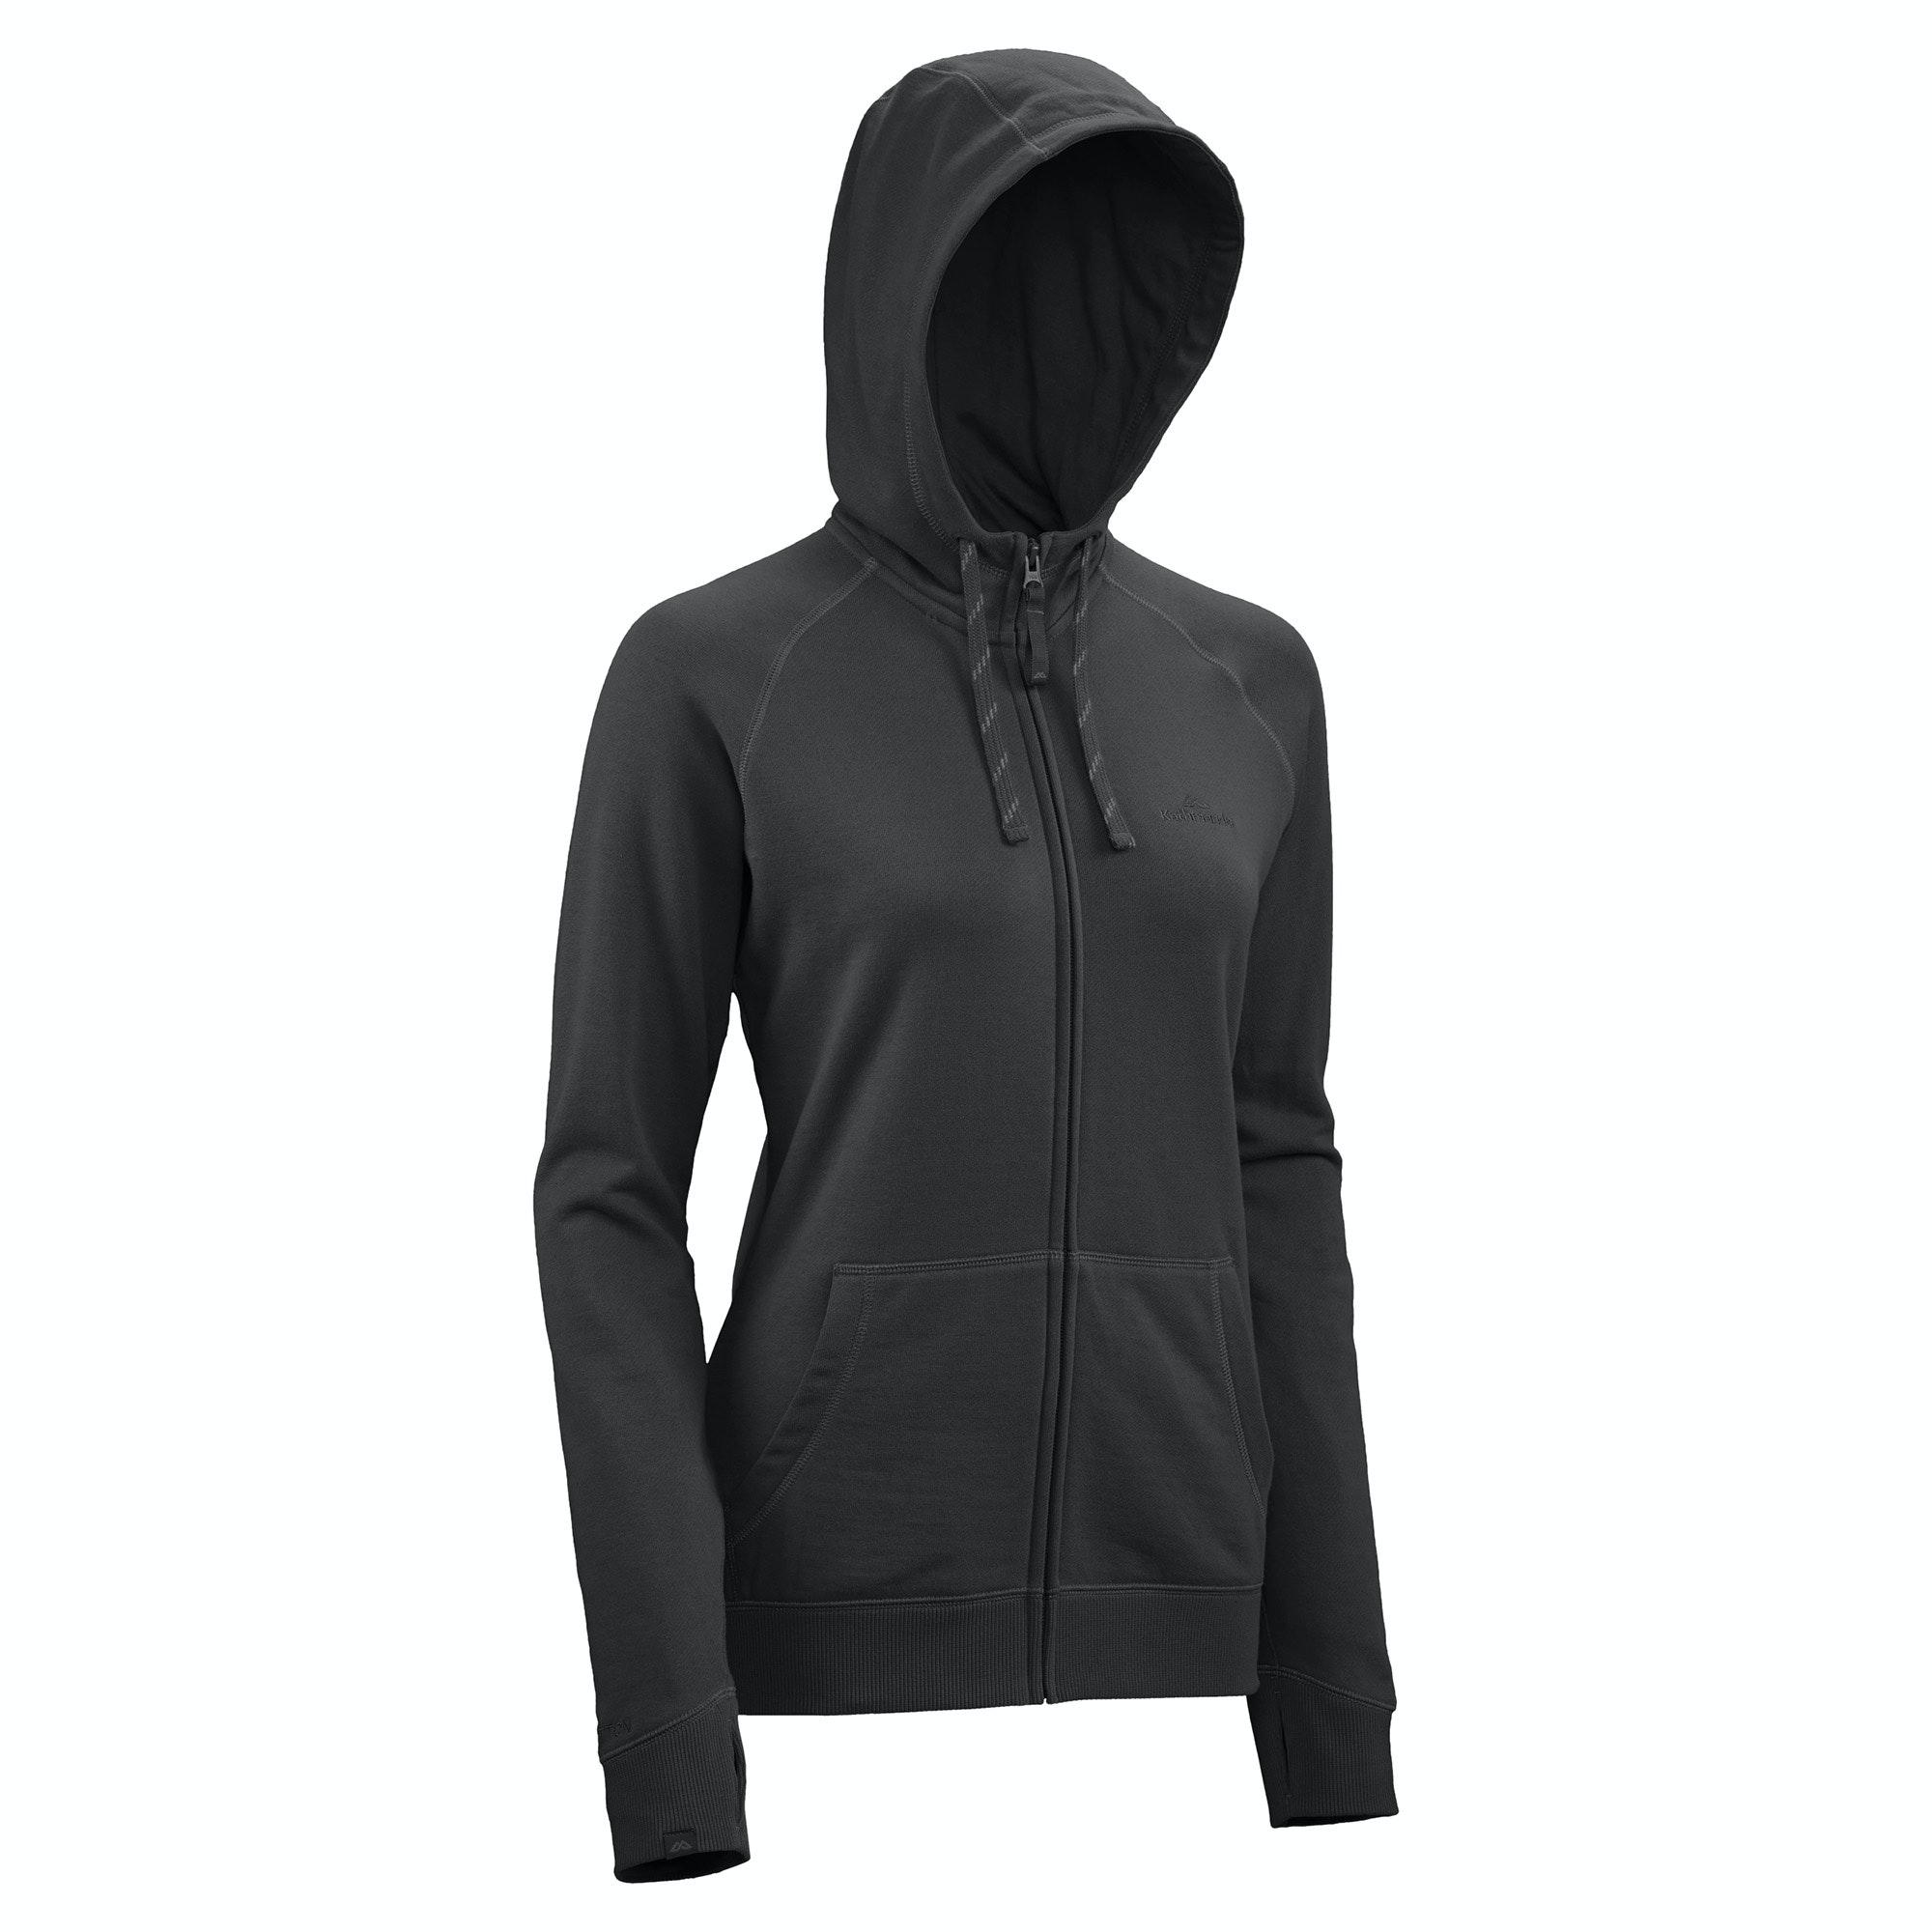 DriCotton Women&39s Hooded Lightweight Fleece Jacket - Lake Blue